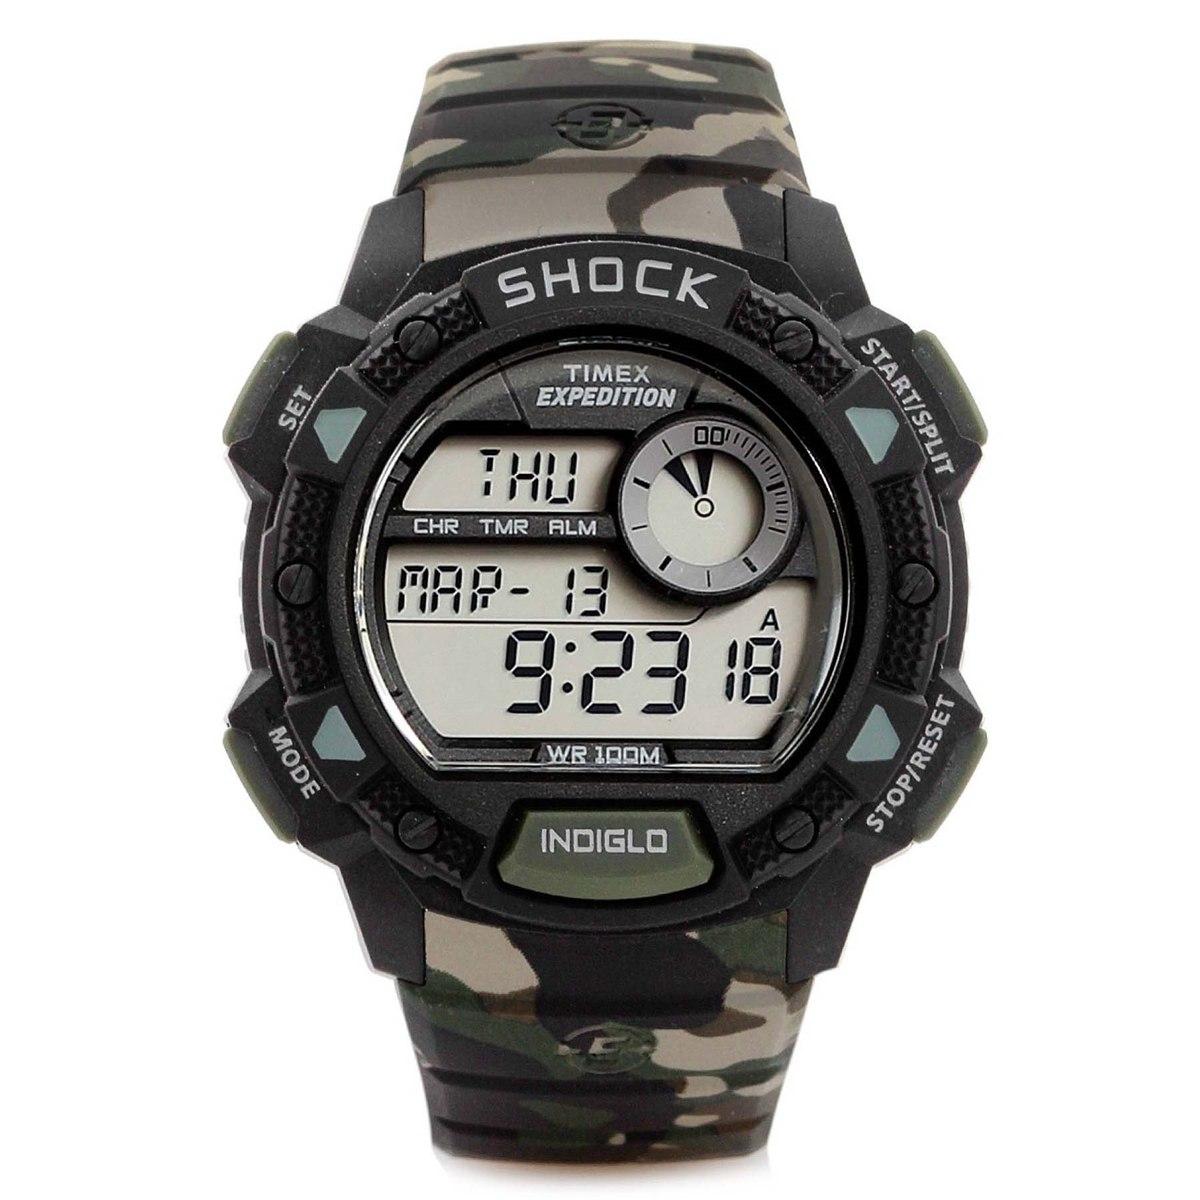 8f1e5309290db Relógio timex expedition shock digital masculino carregando zoom jpg  1200x1200 Relogio timex digital